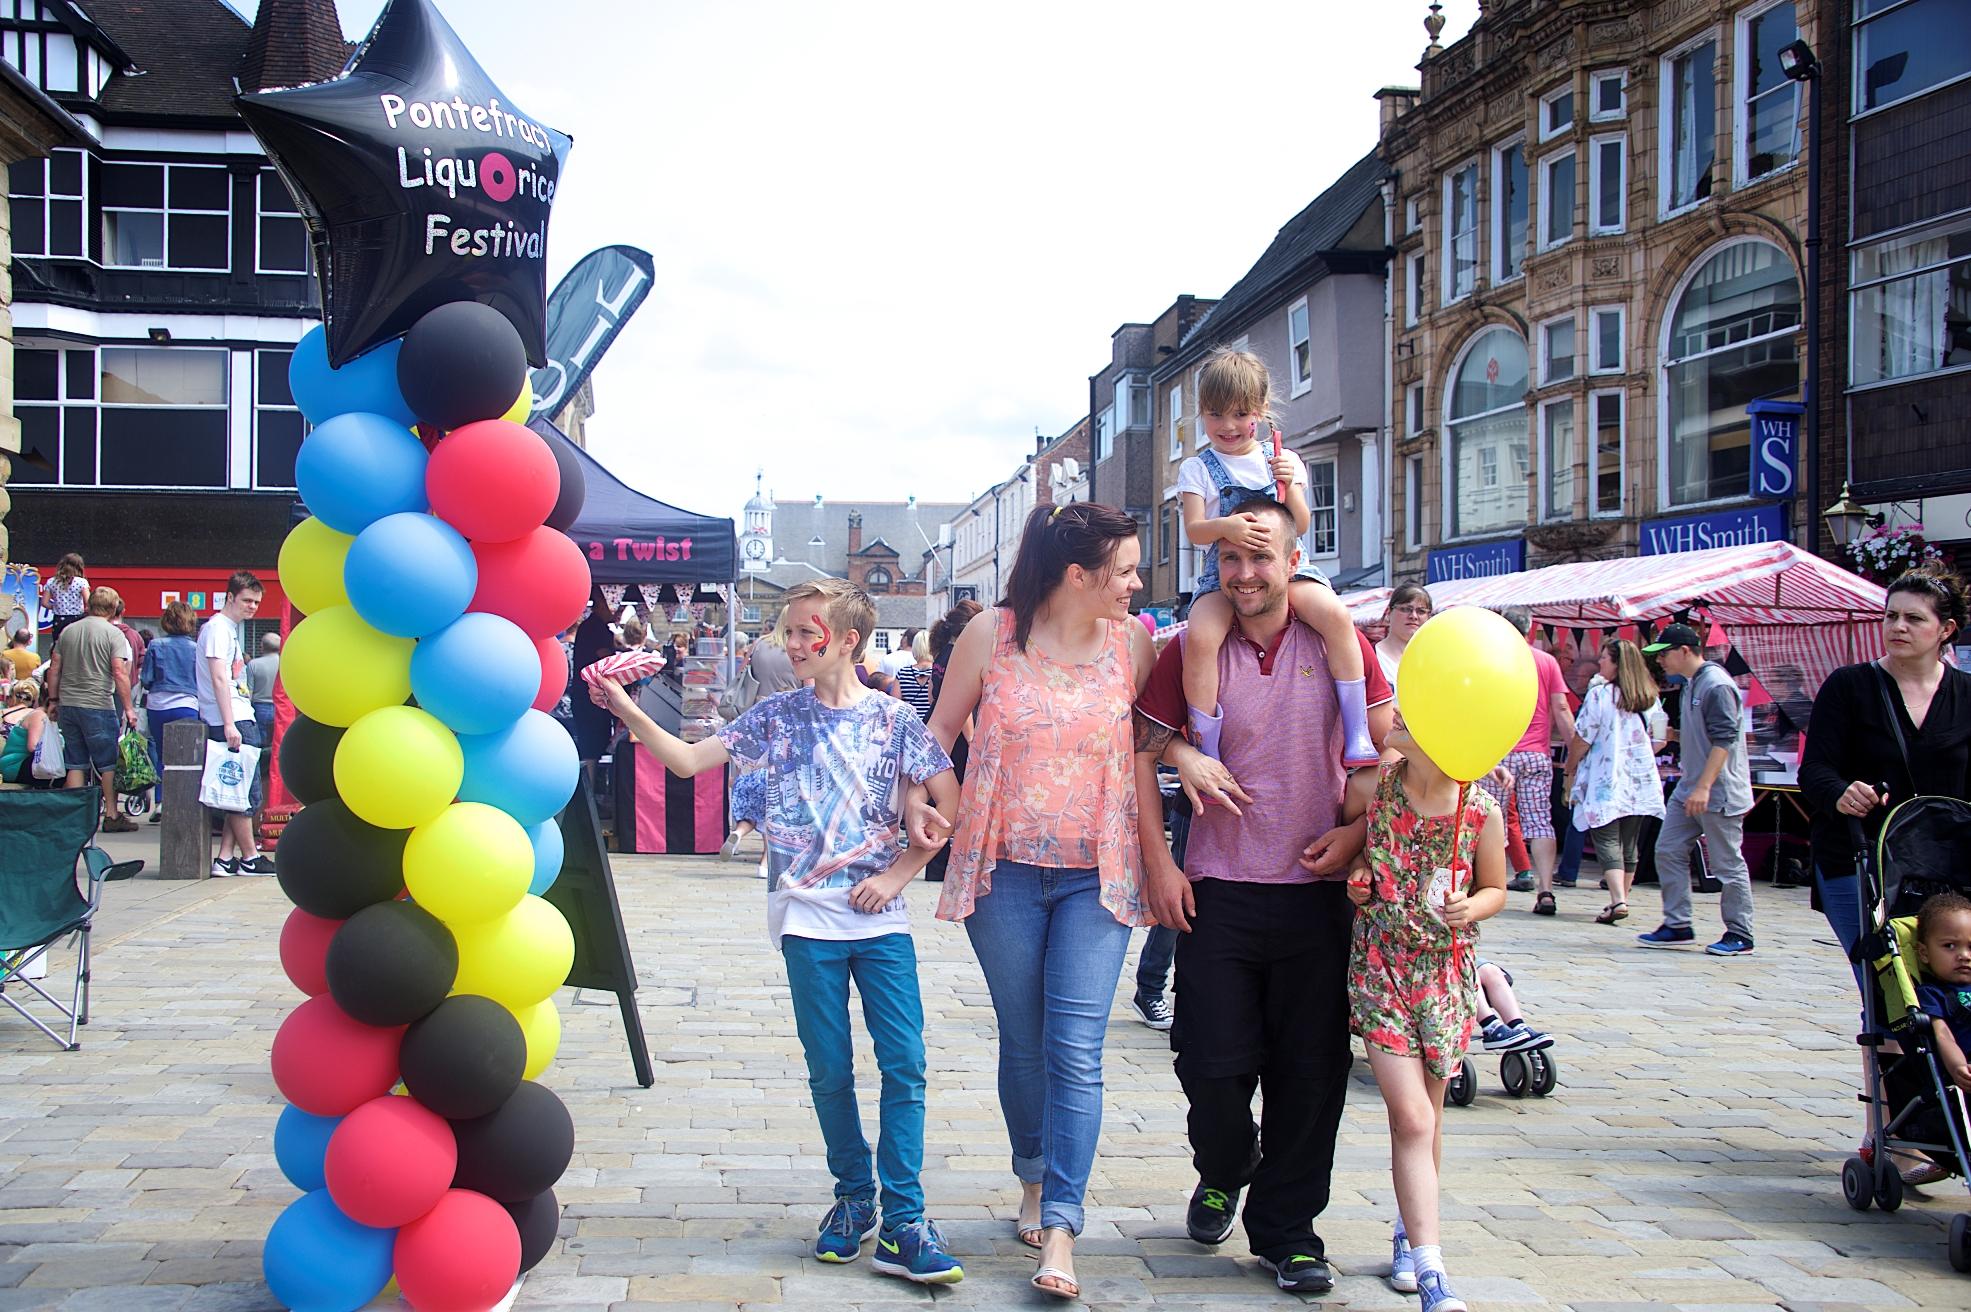 Pontefract Liquorice Festival © Wakefield Council